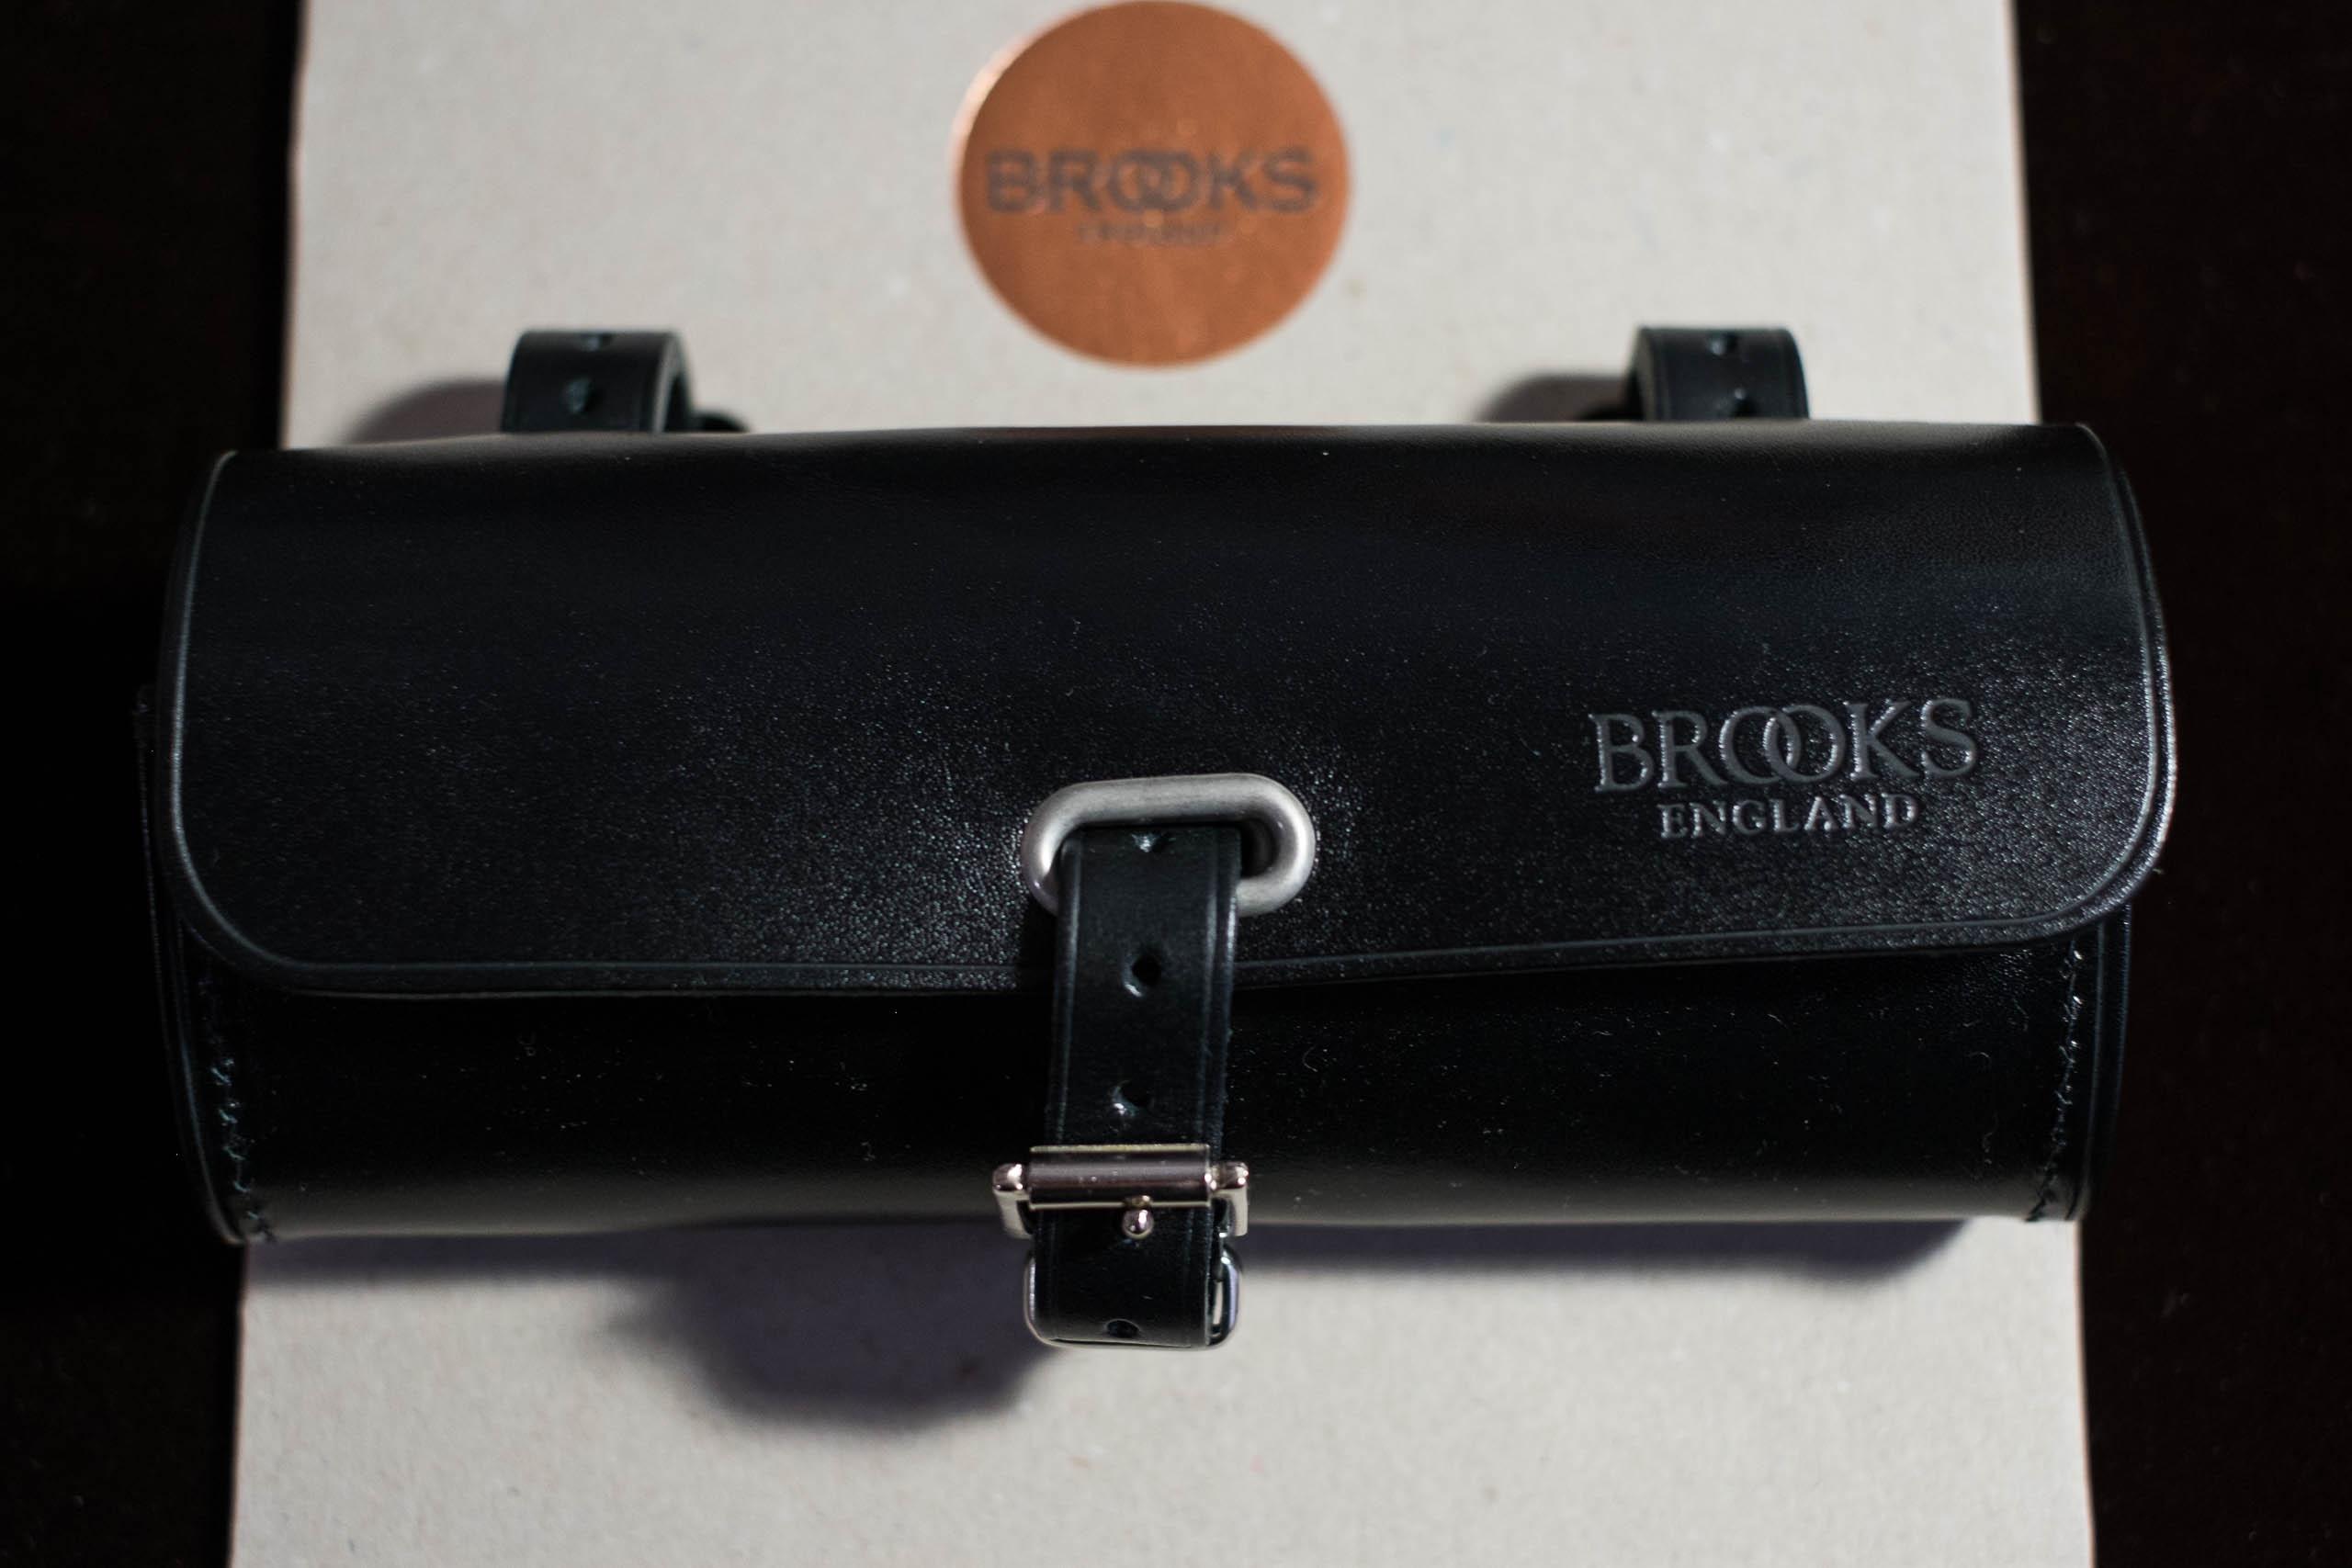 Brooks Challenge Satteltasche Apfelgr/ün